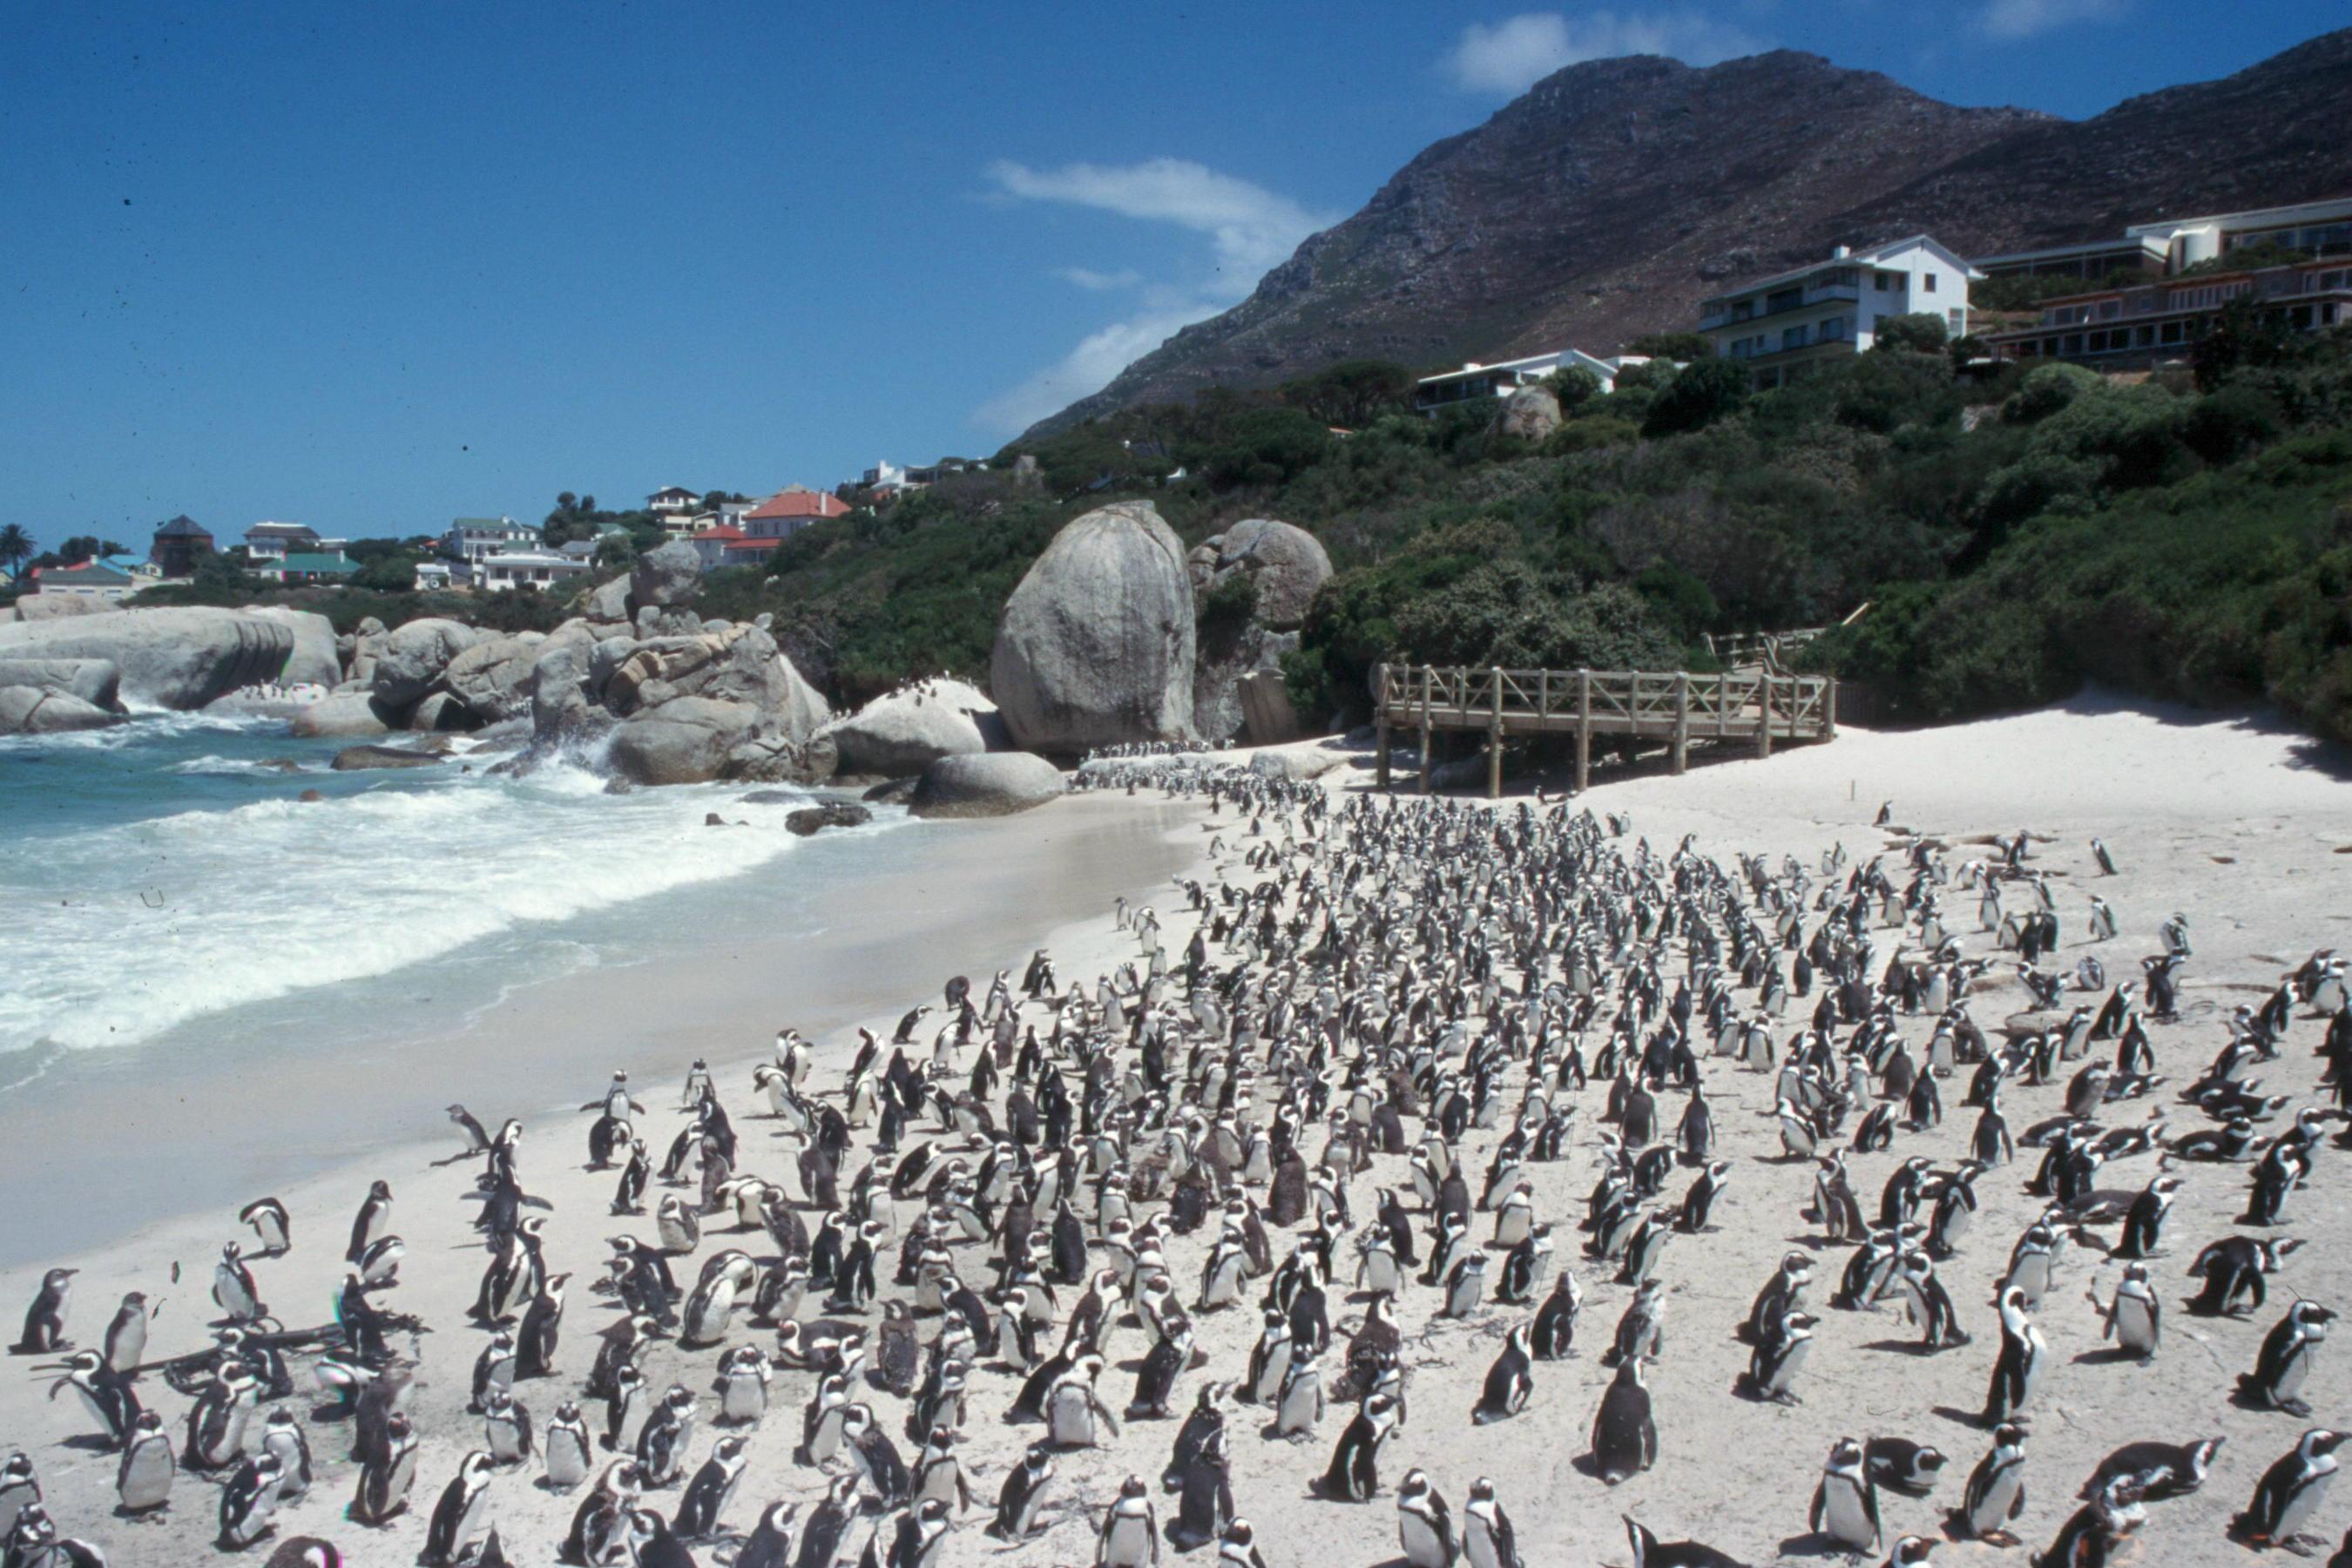 boulders-beach-penguin-Scan63